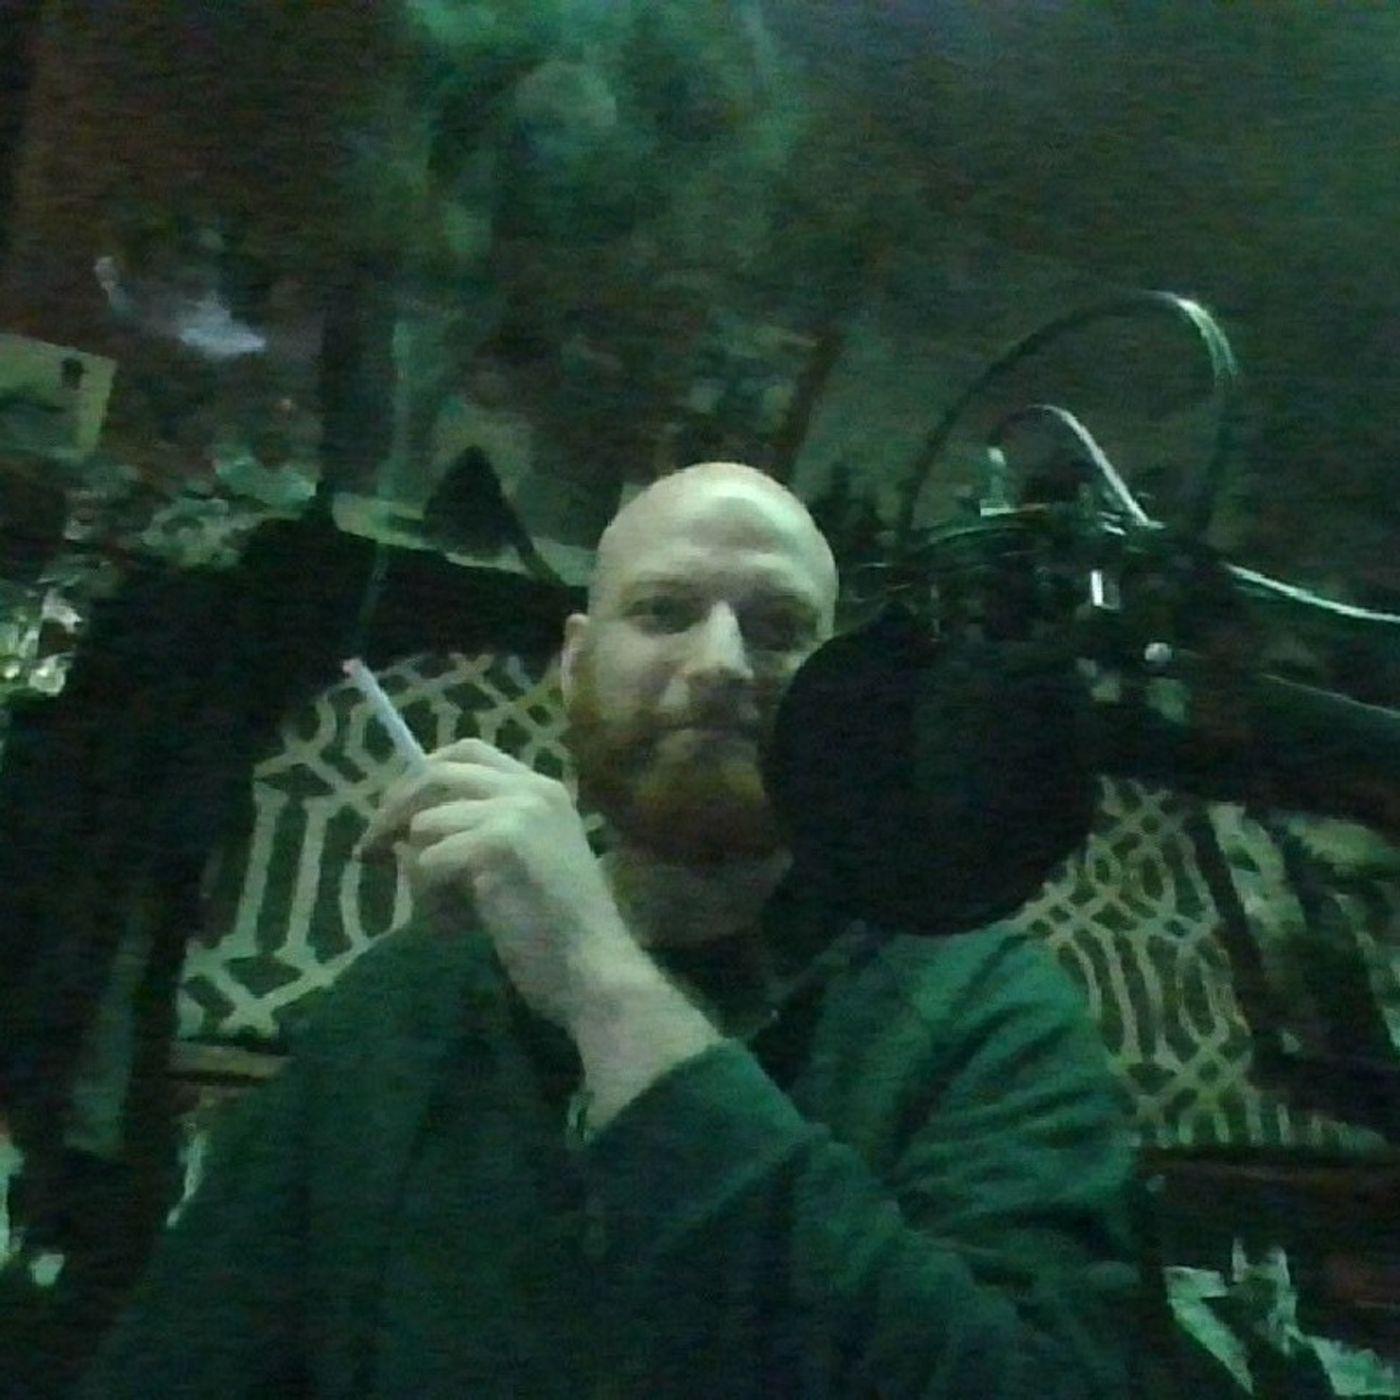 Episode 152 - On The Fly Live Goth & Darkwave. segment 2